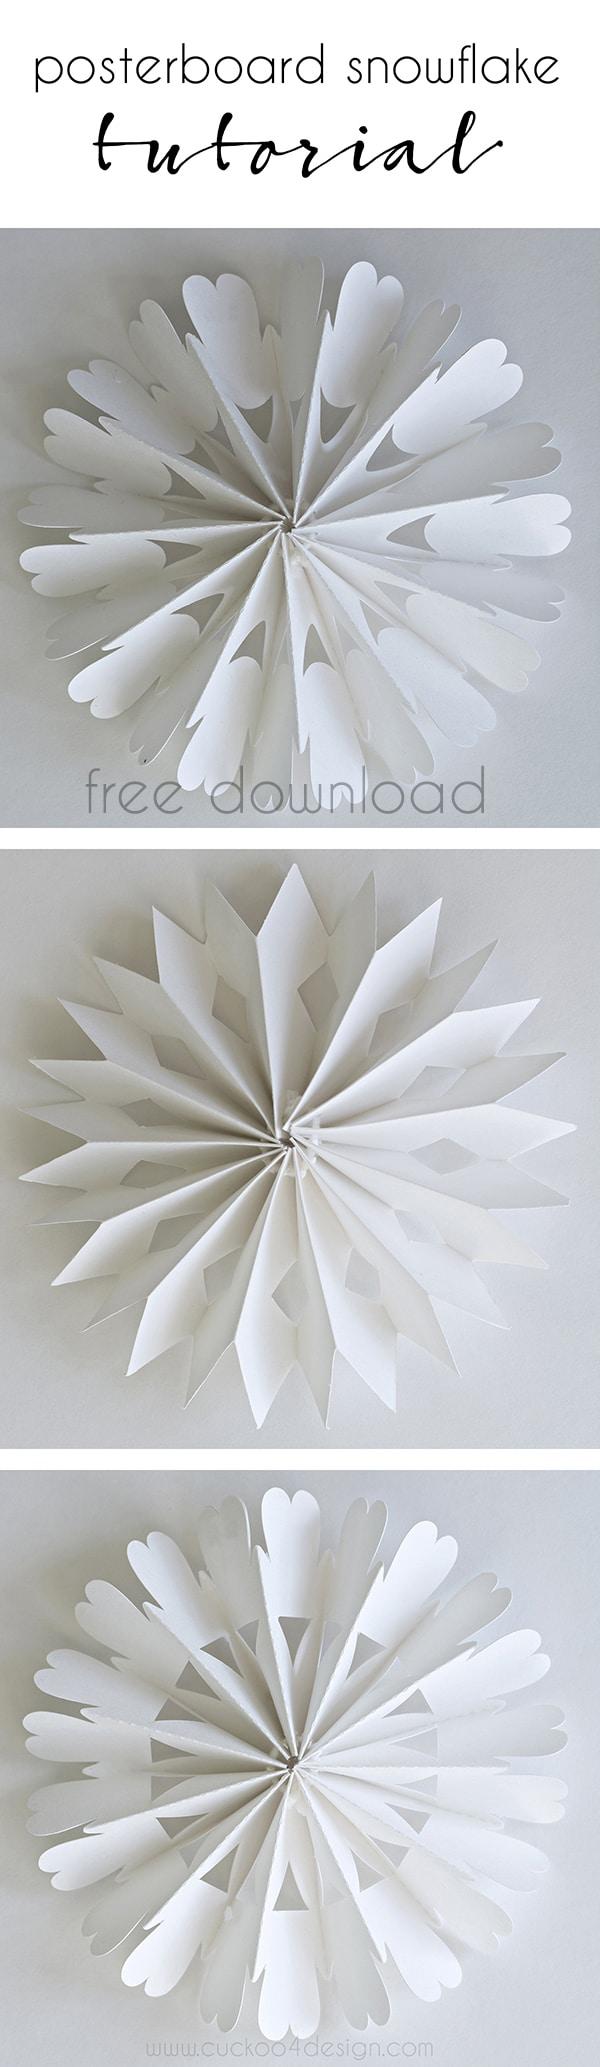 diy_posterboard_snowflake_ornament_free-download_cuckoo4design